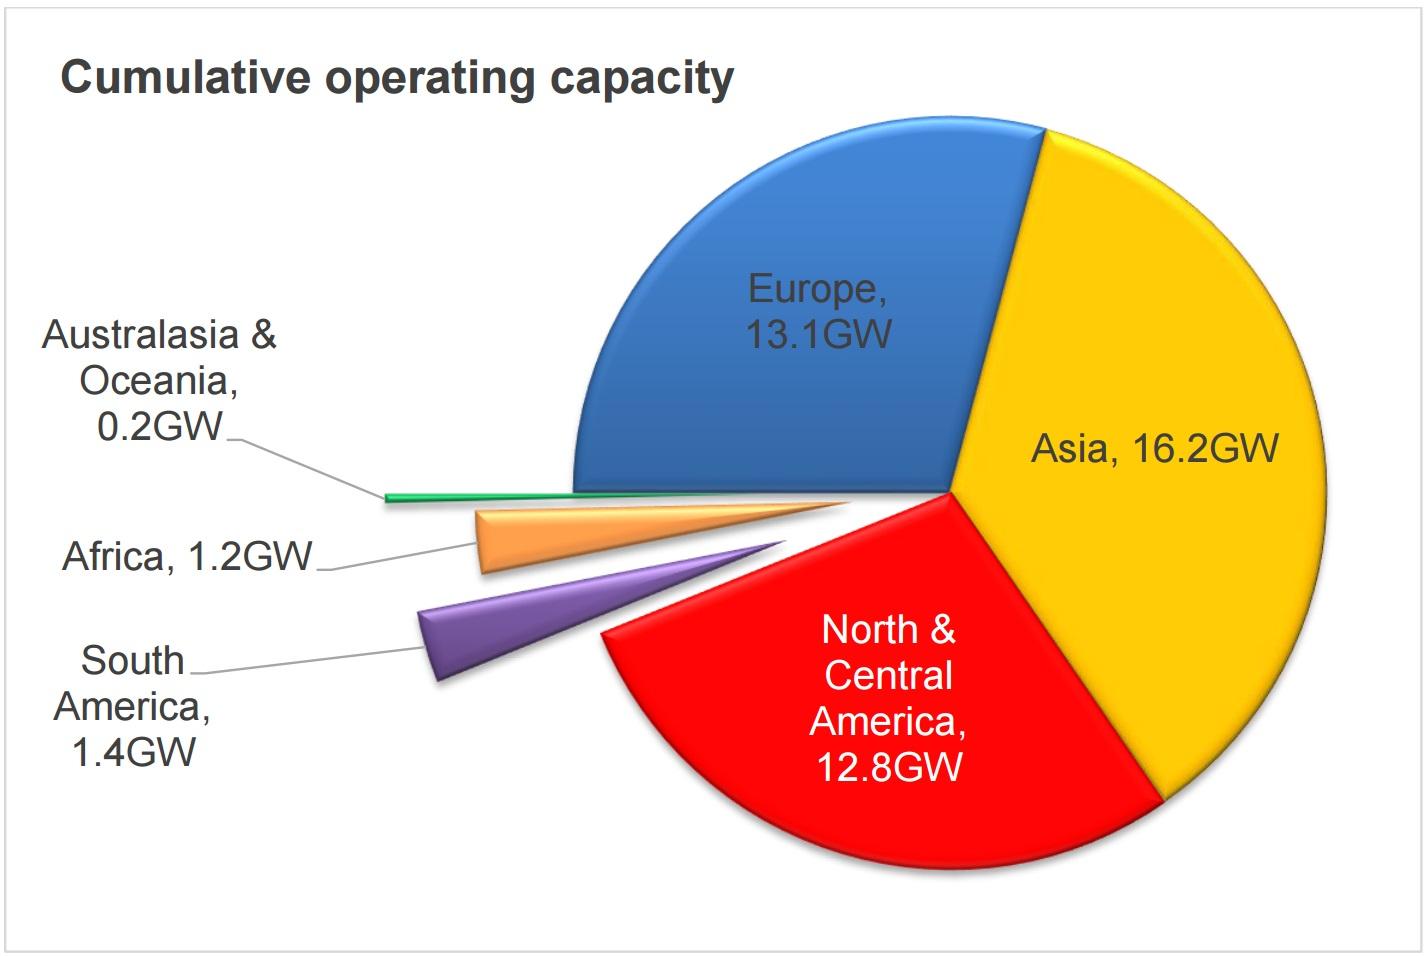 Global Utility-Scale Solar PV Capacity Reaches 45 GW, Wiki